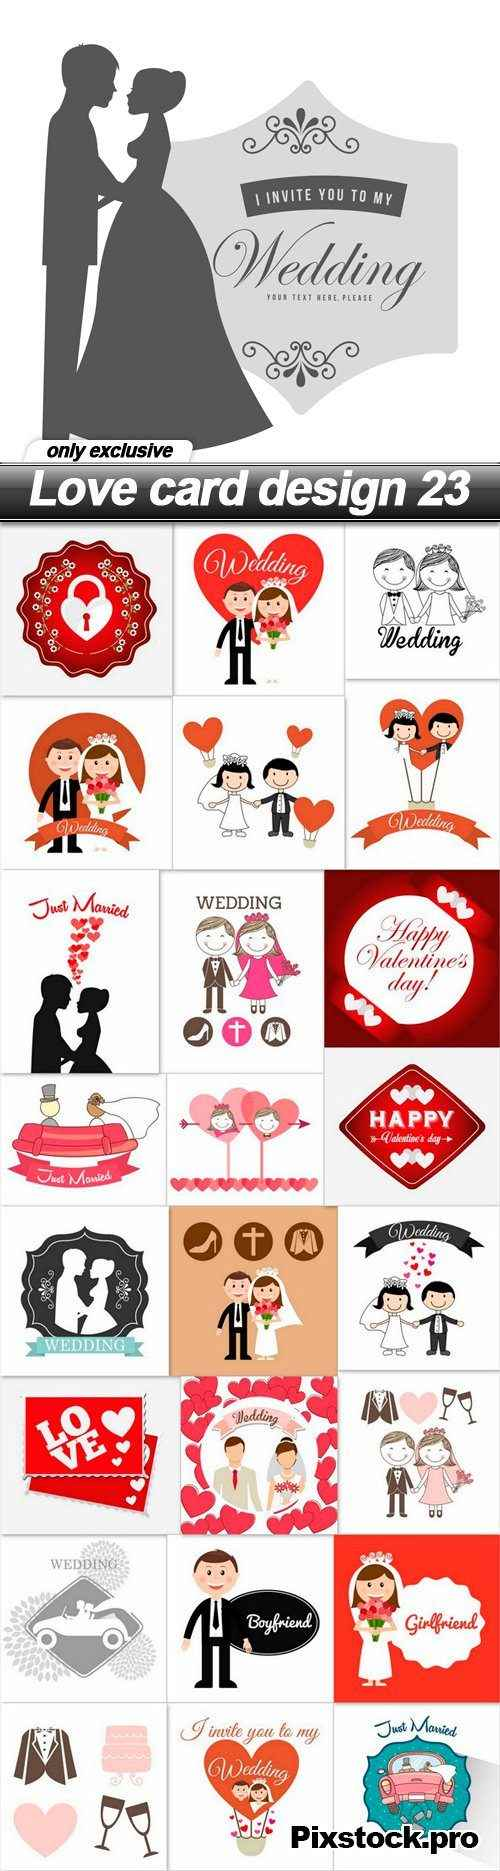 Love card design 23 – 25 EPS